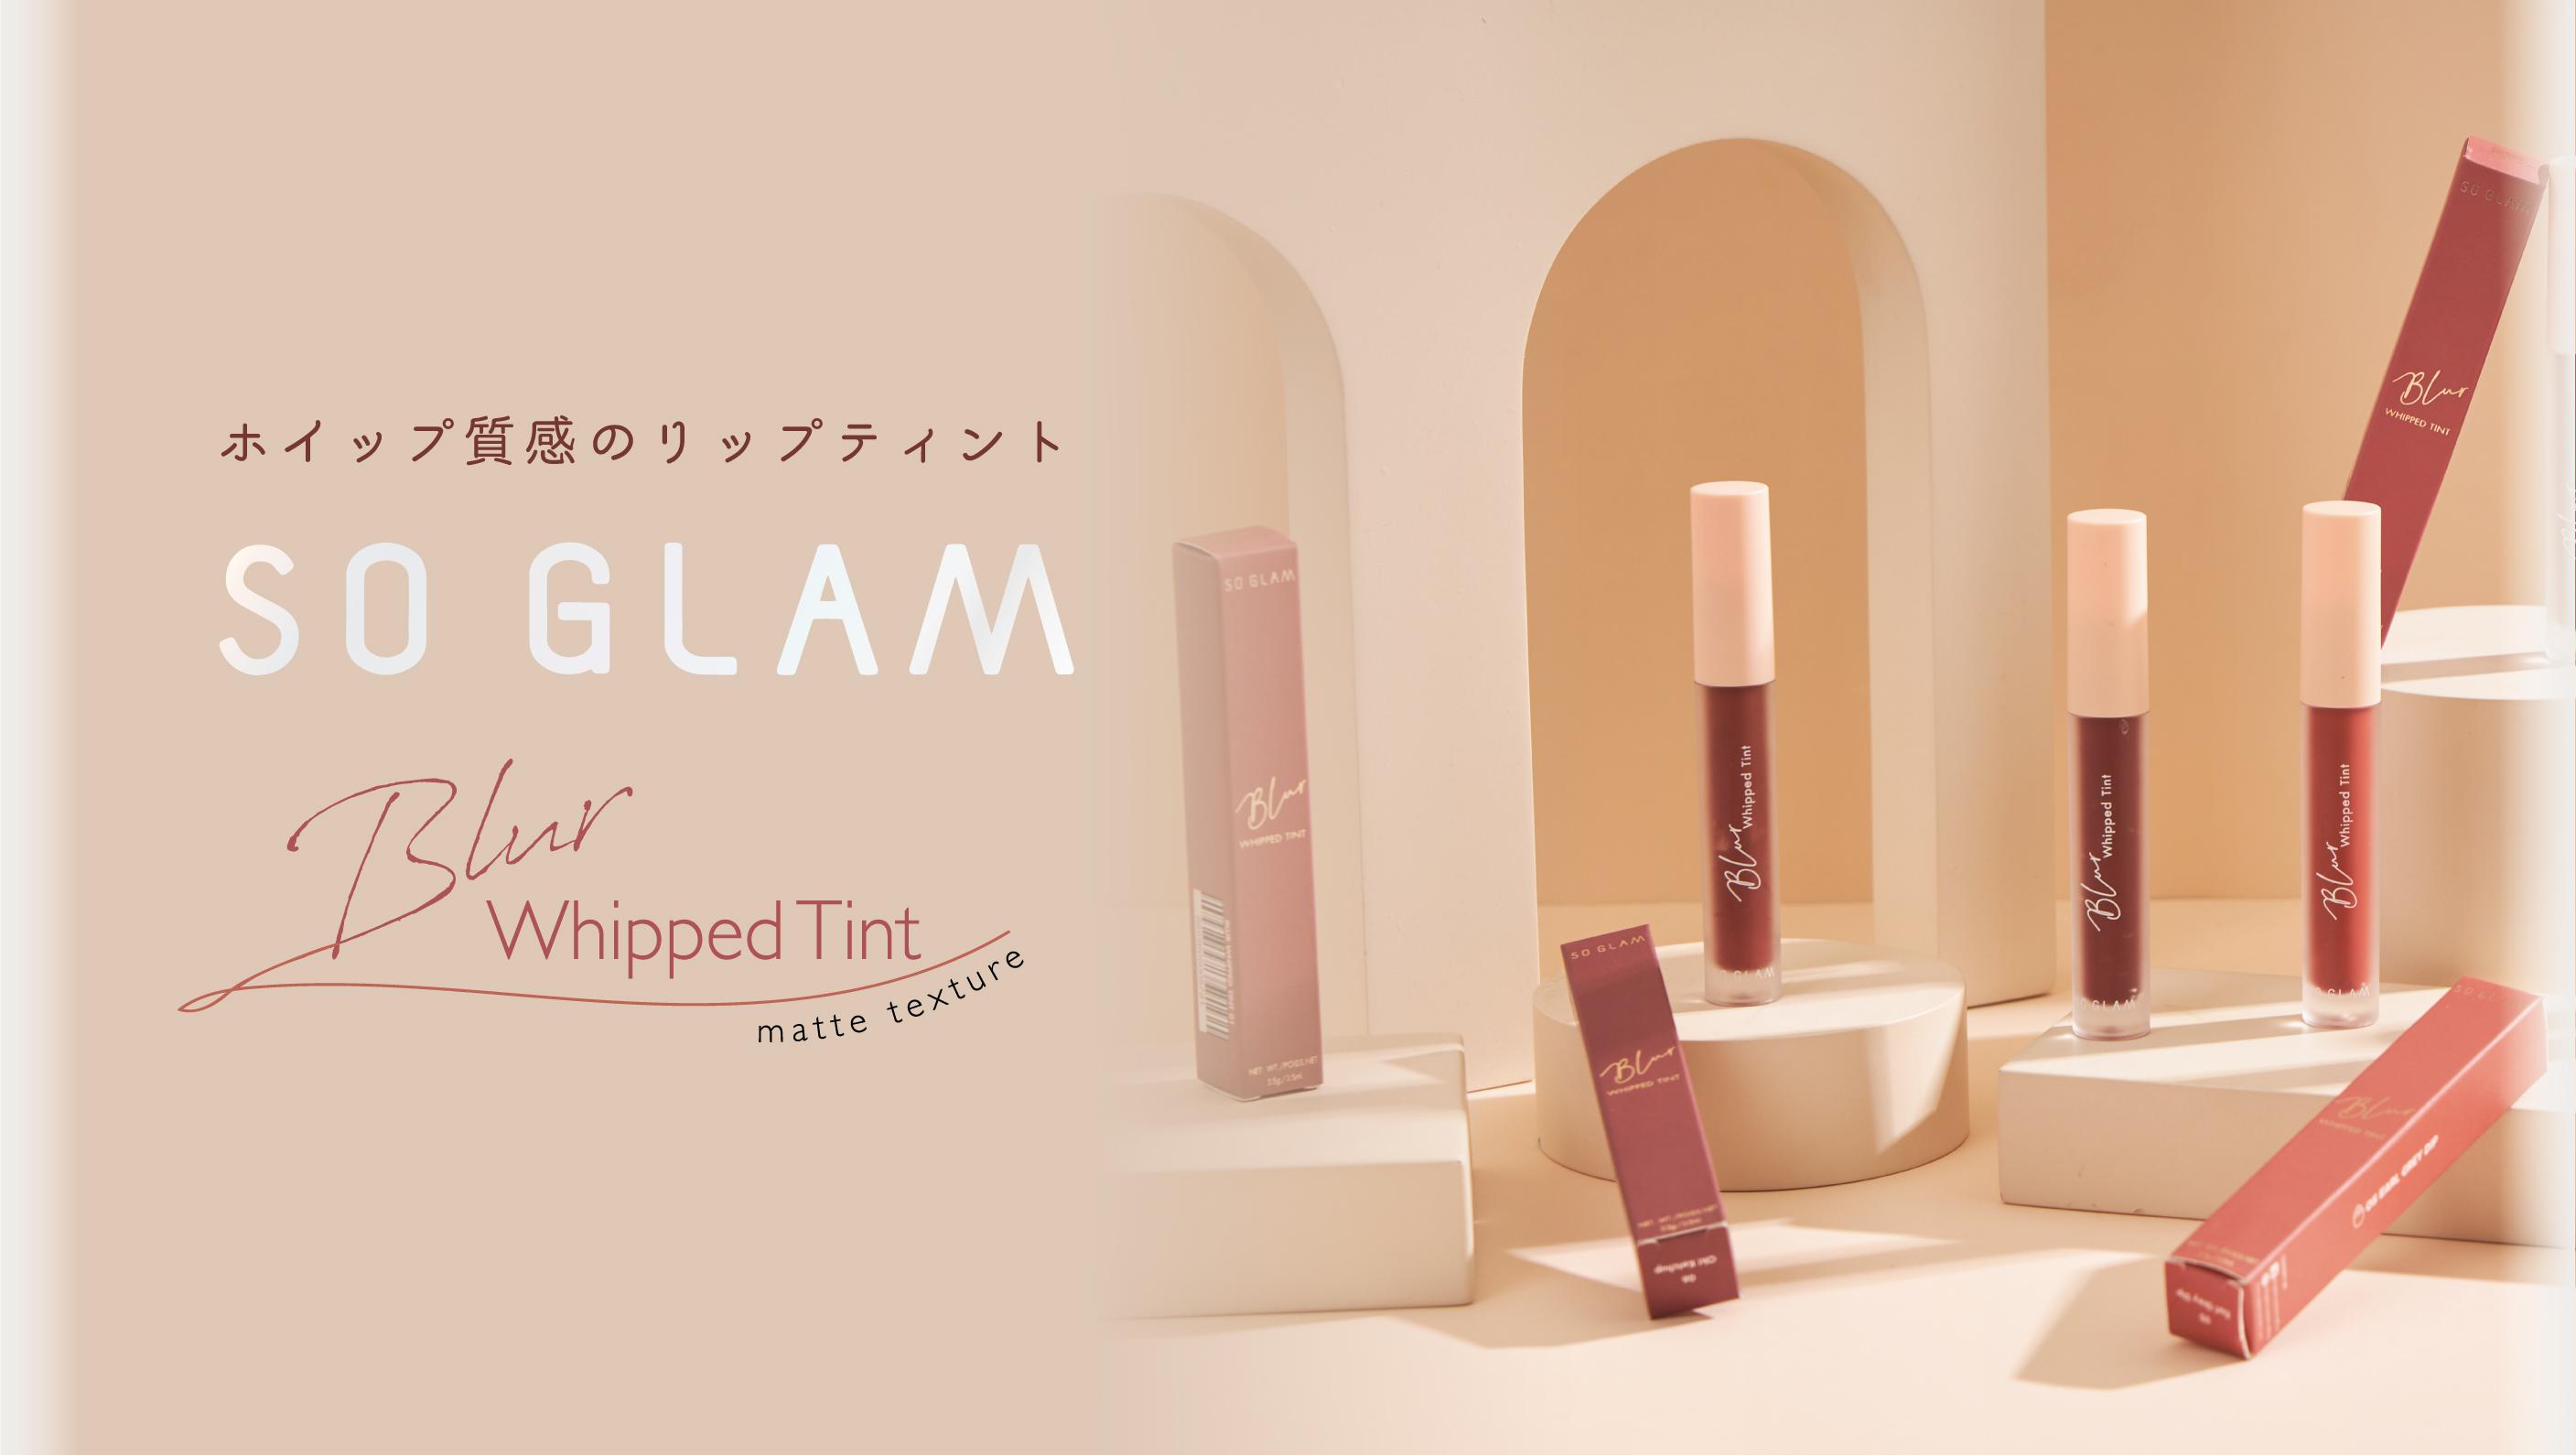 kailijumei - カイリジュメイ -